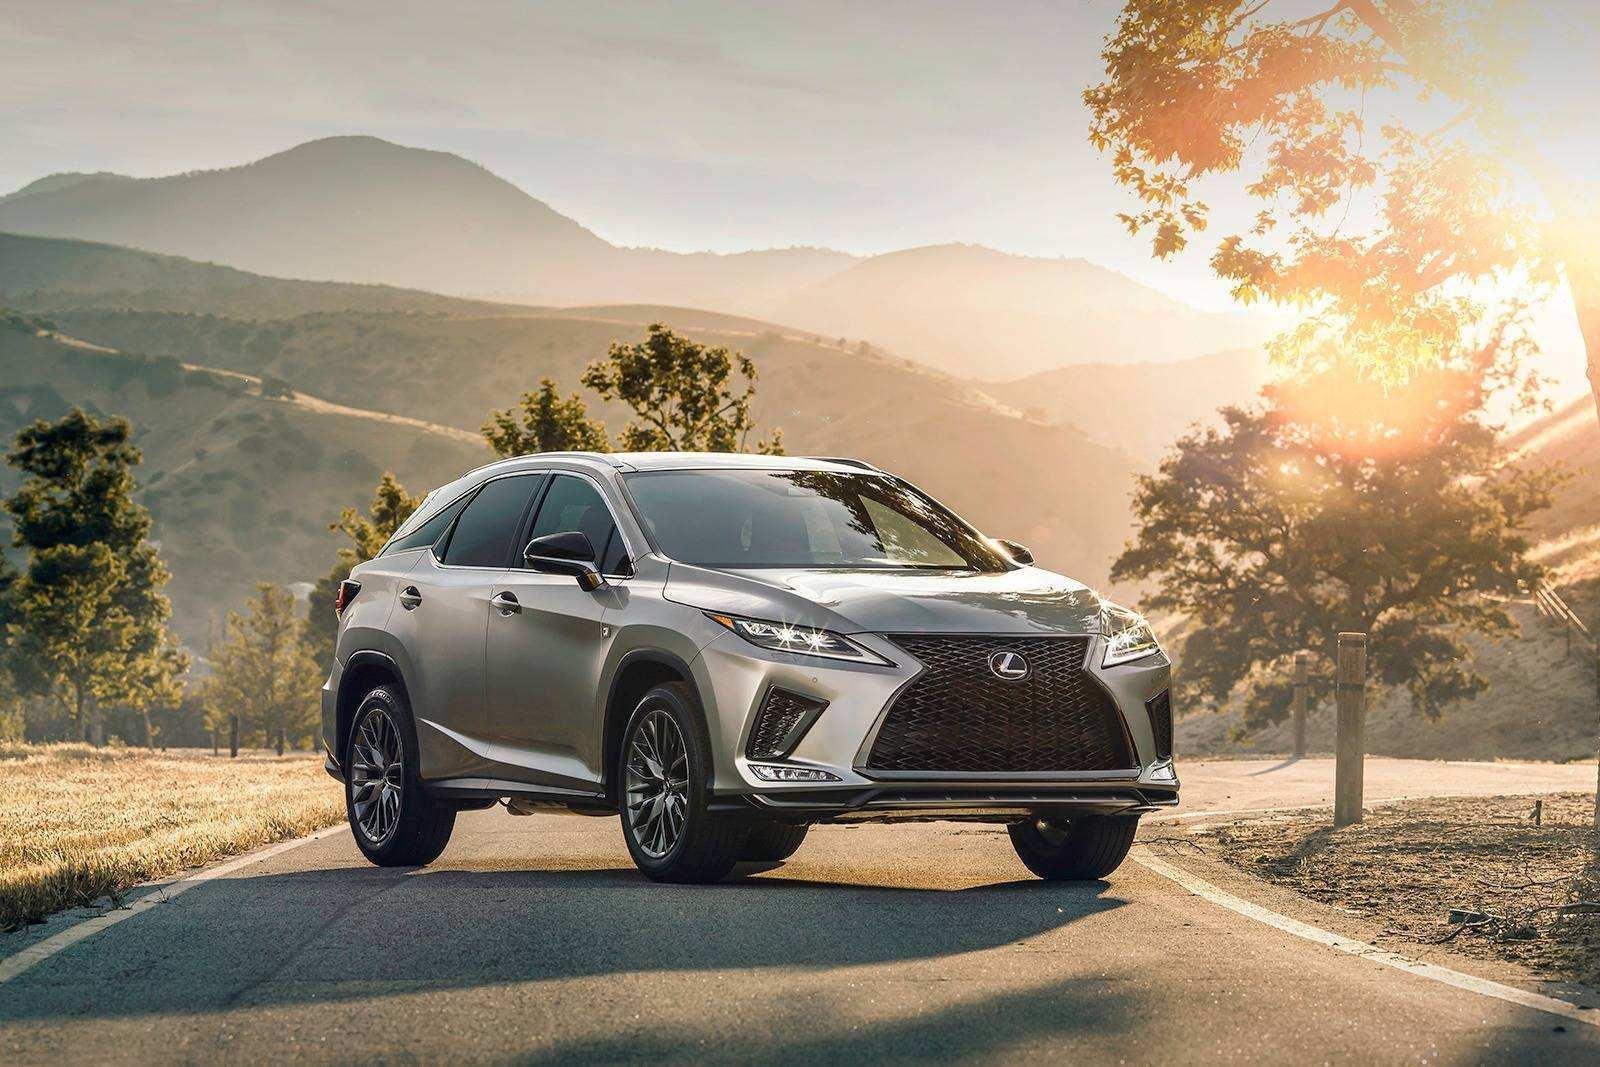 95 New Lexus Plug In Hybrid 2020 Release by Lexus Plug In Hybrid 2020